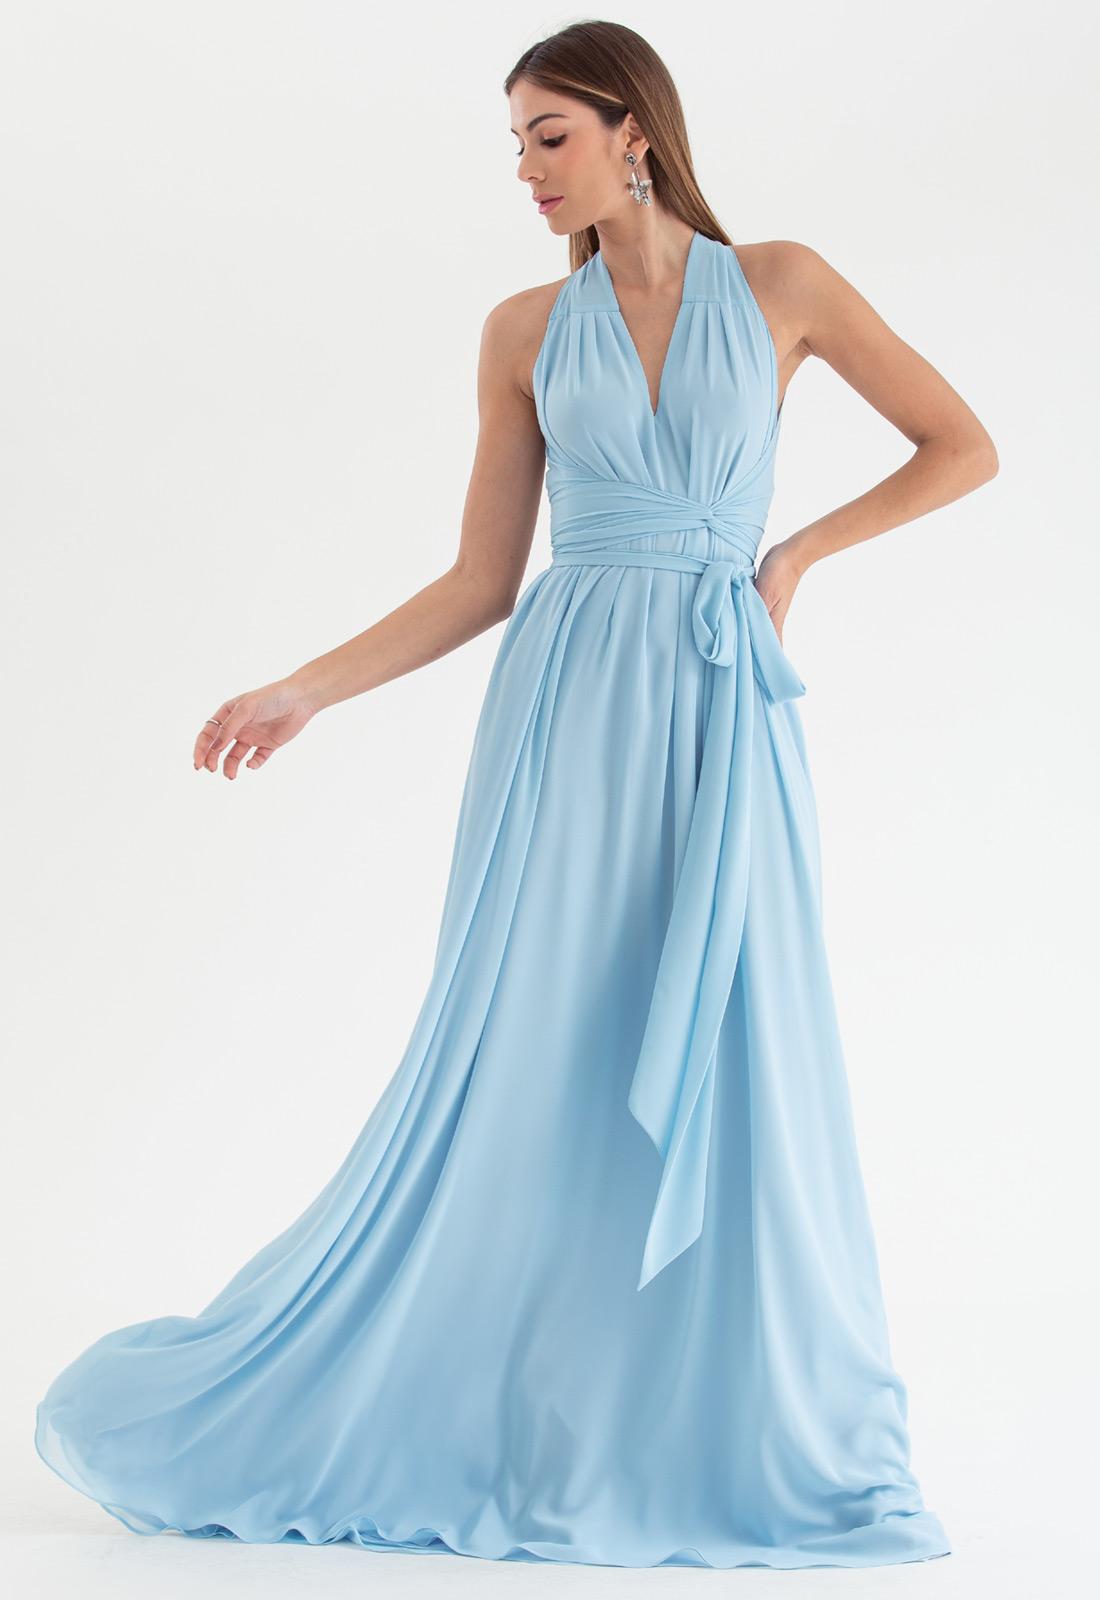 Vestido de festa azul serenity multi-tamanho Ref. 2580